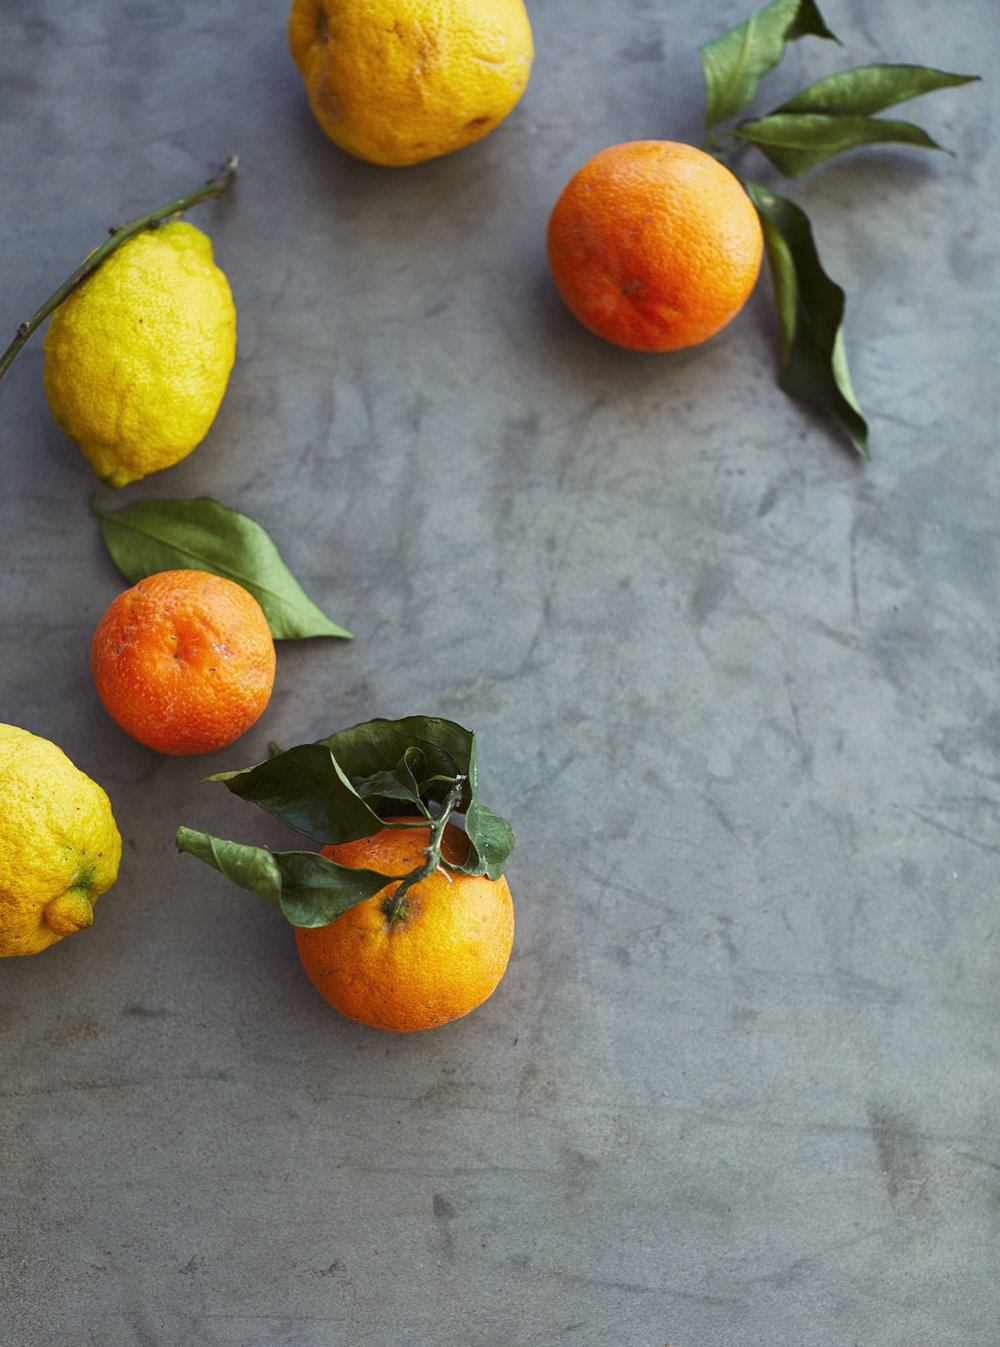 Oranges&Lemons_025.jpg